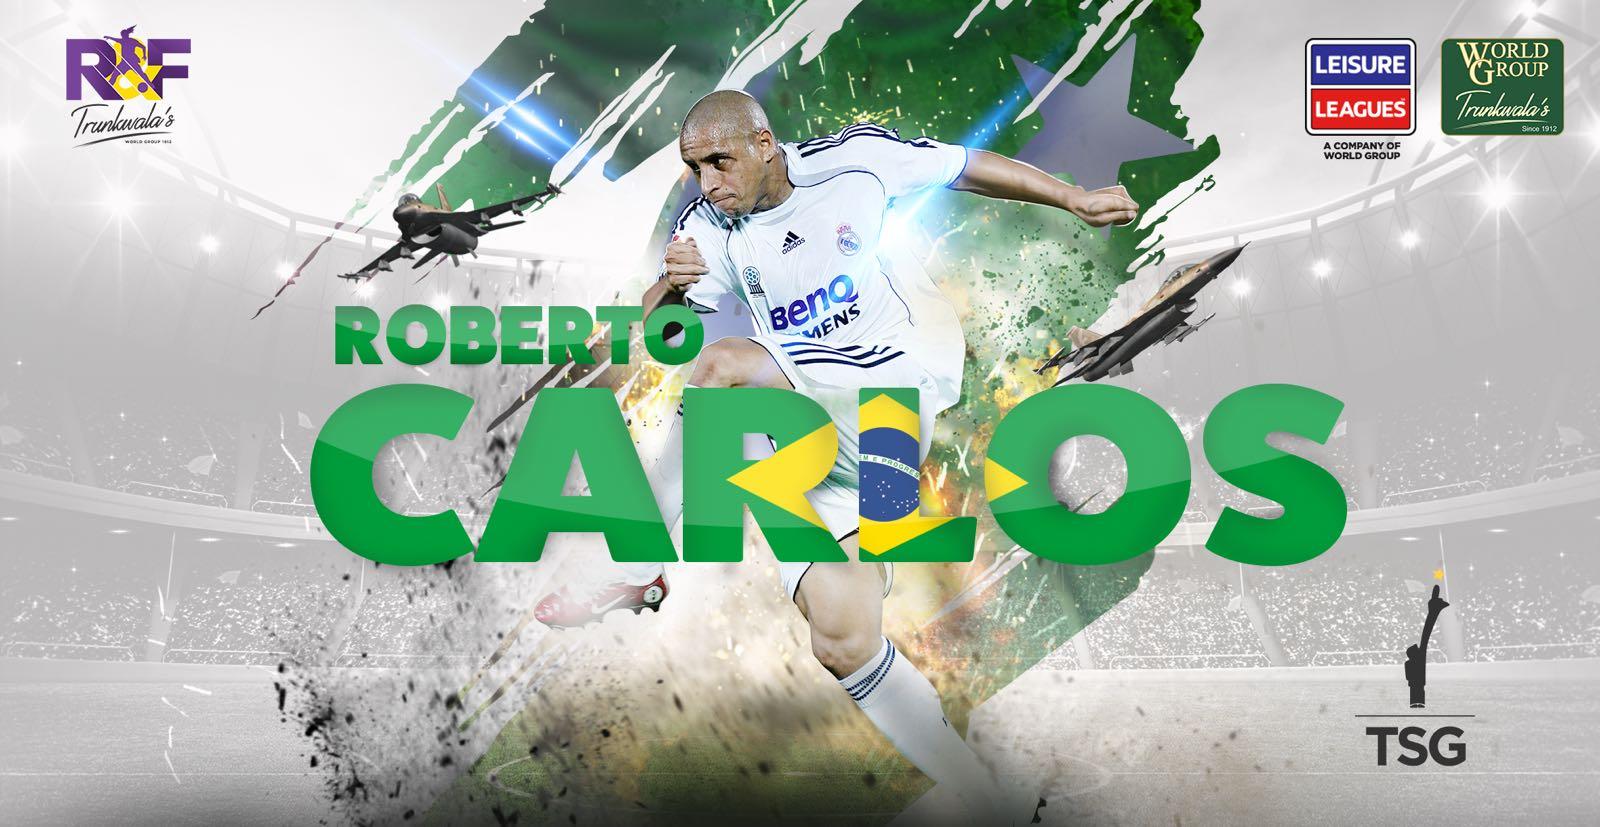 brazil legend roberto carlos to play in pakistan